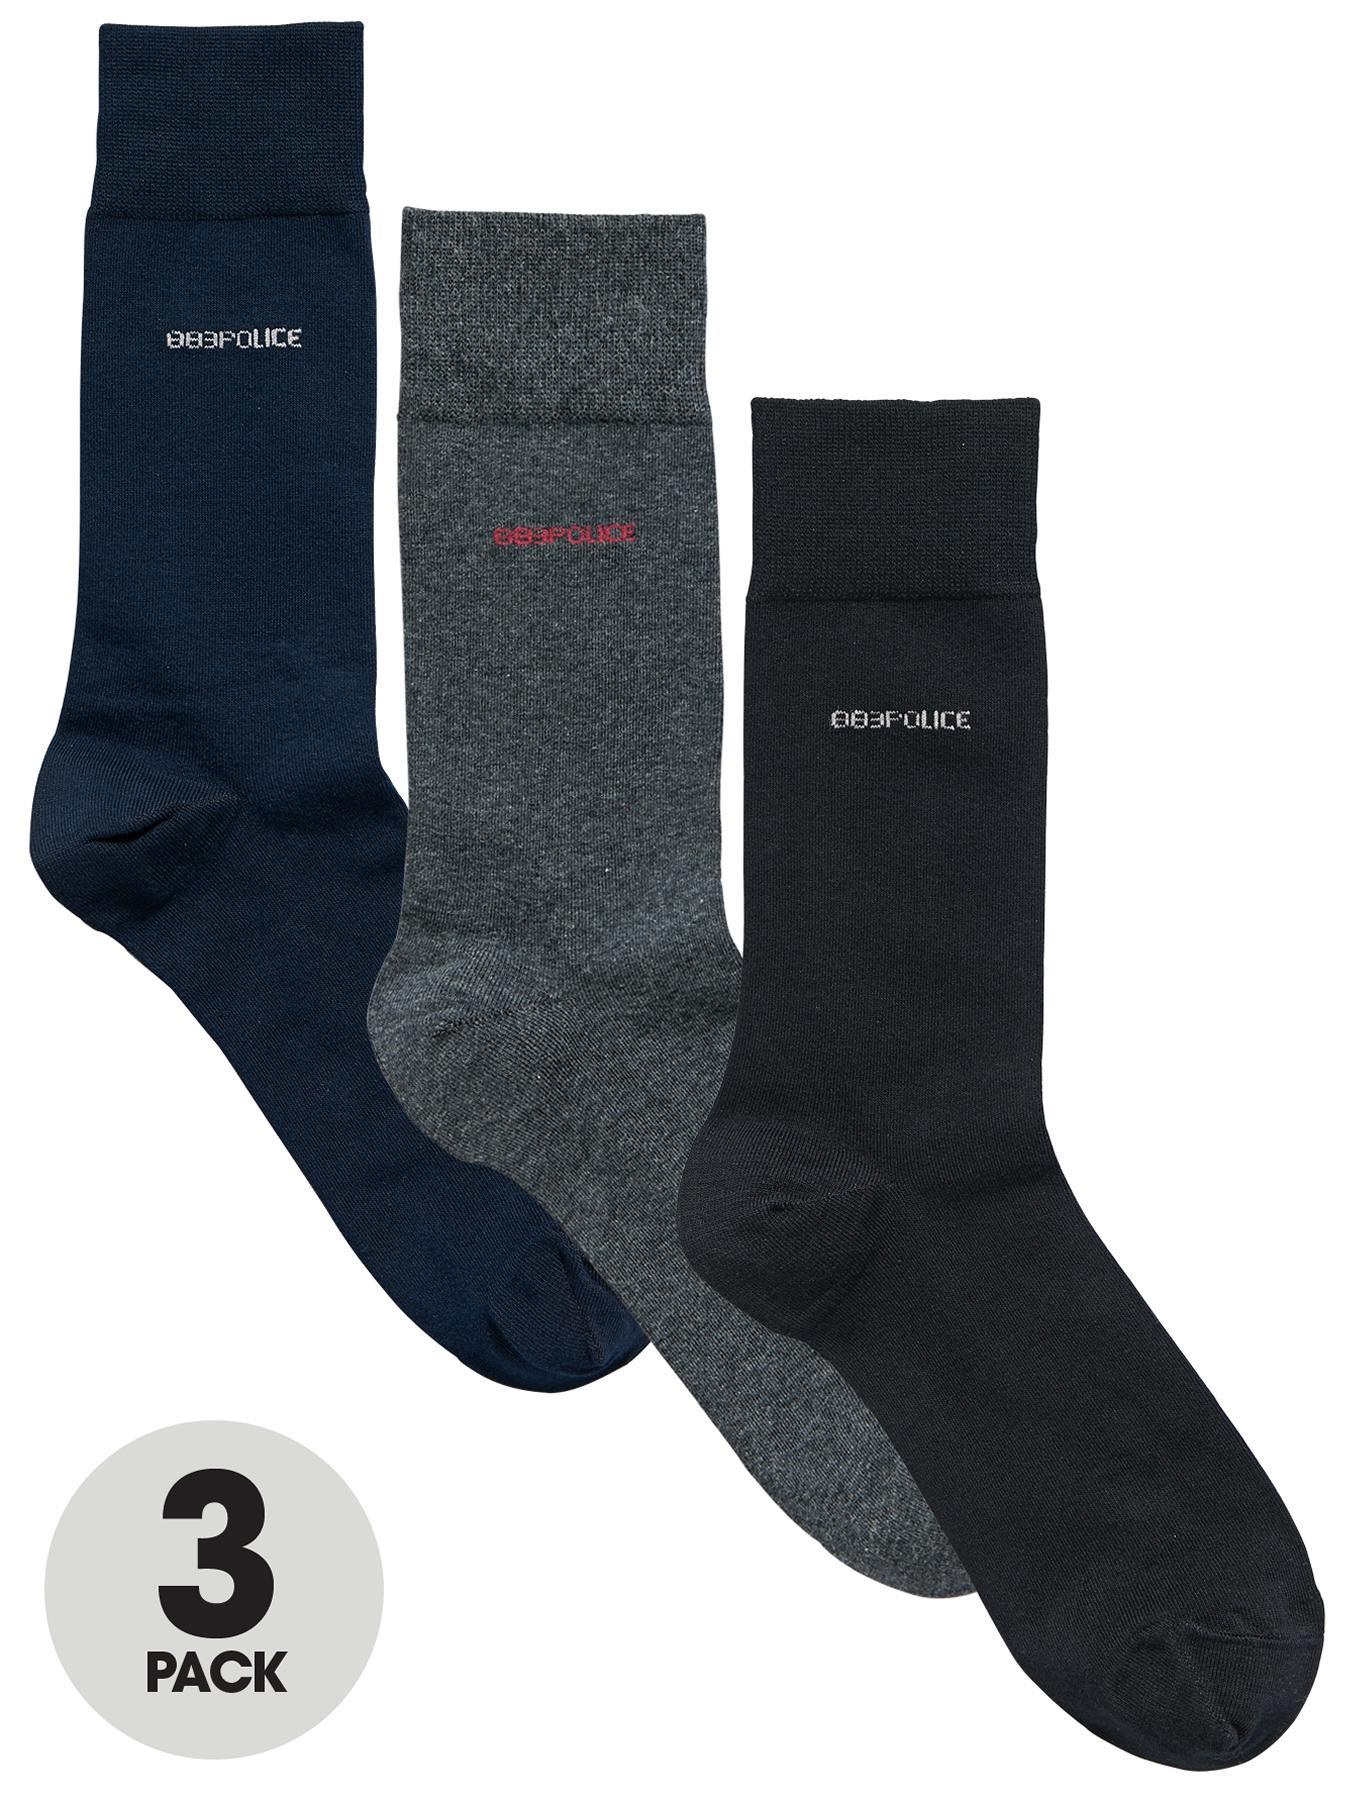 Deseo Socks (3 Pack), Navy at Littlewoods